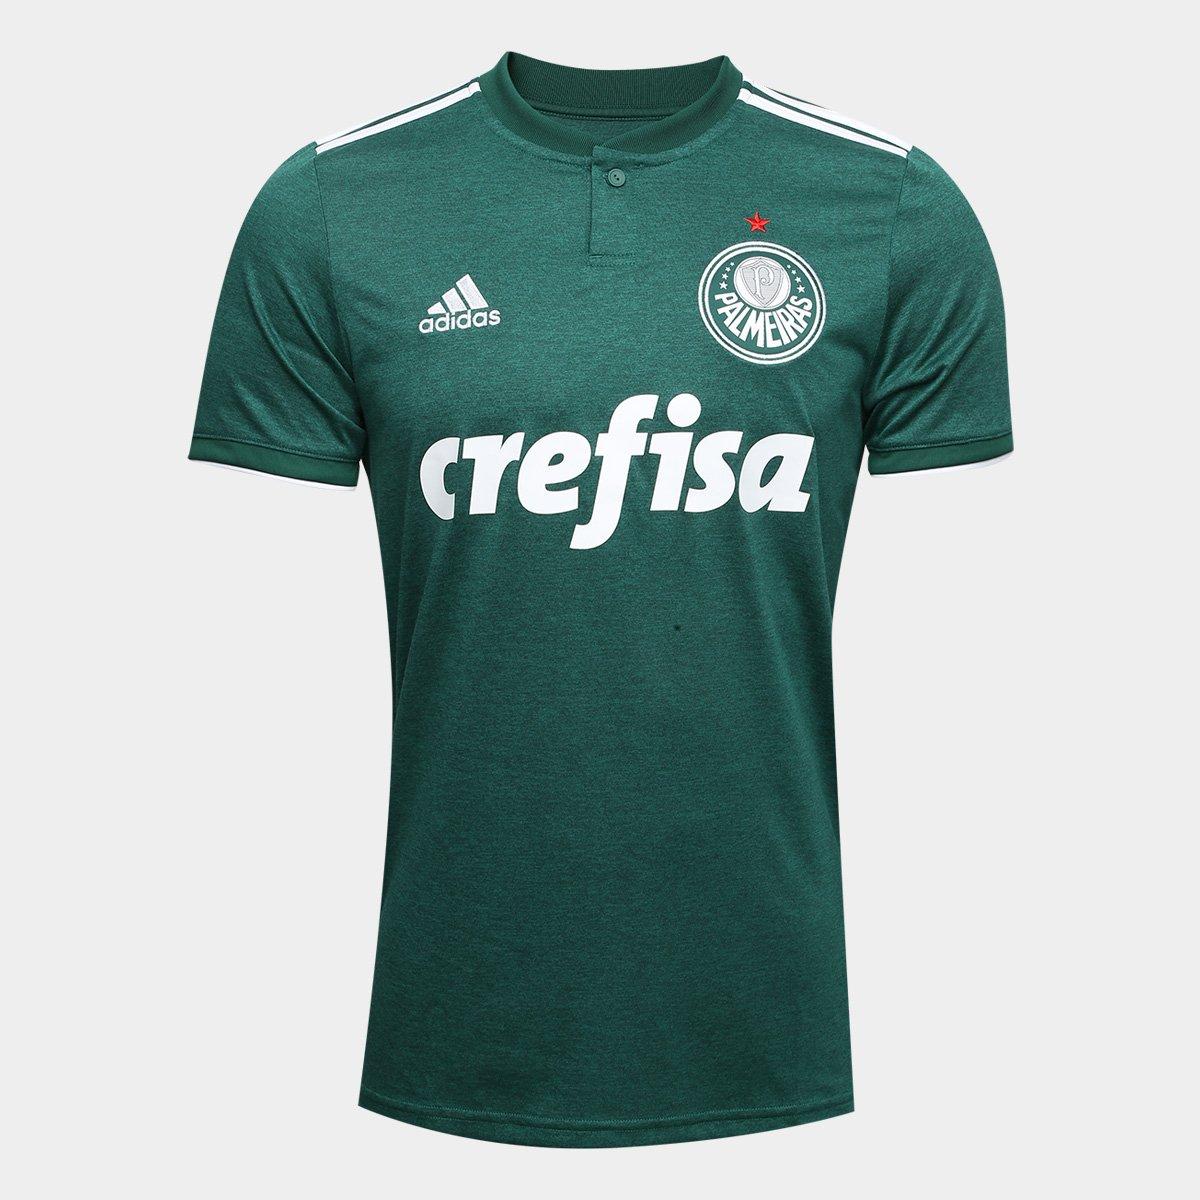 205ddd44ef Camisa Palmeiras I 2018 s n° Torcedor Adidas Masculina - Compre ...